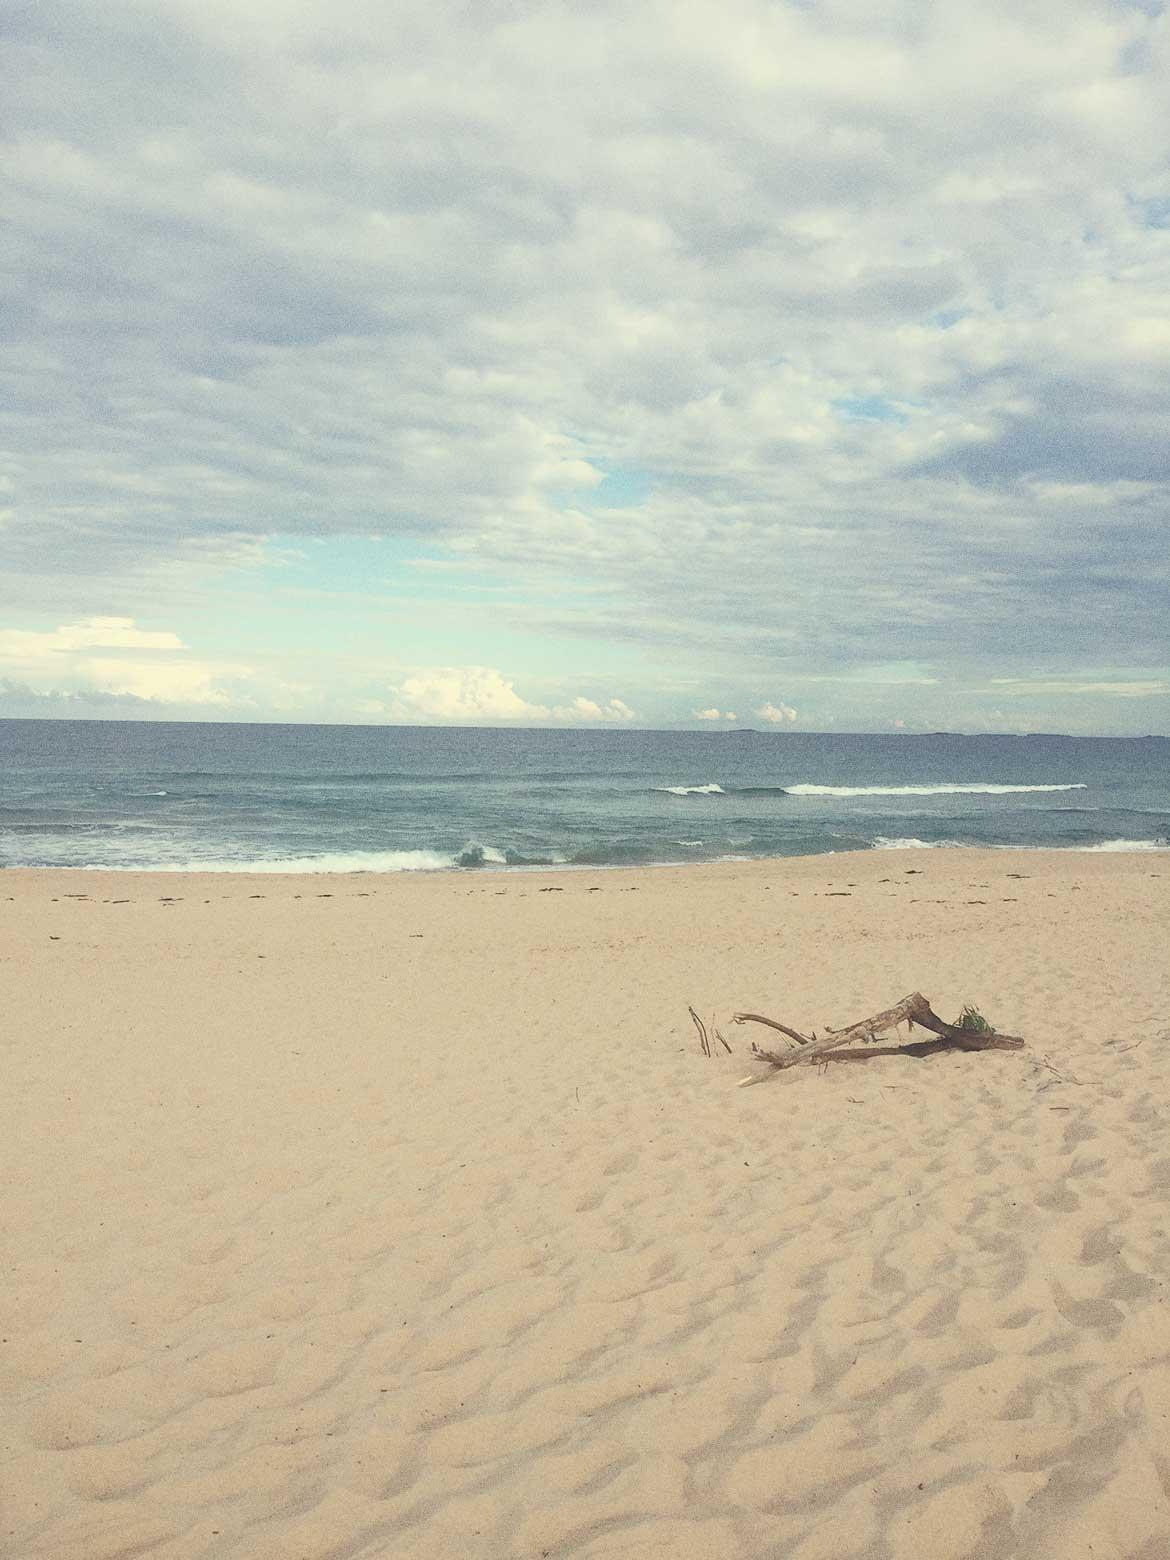 Beautiful Australian beach, completely deserted.